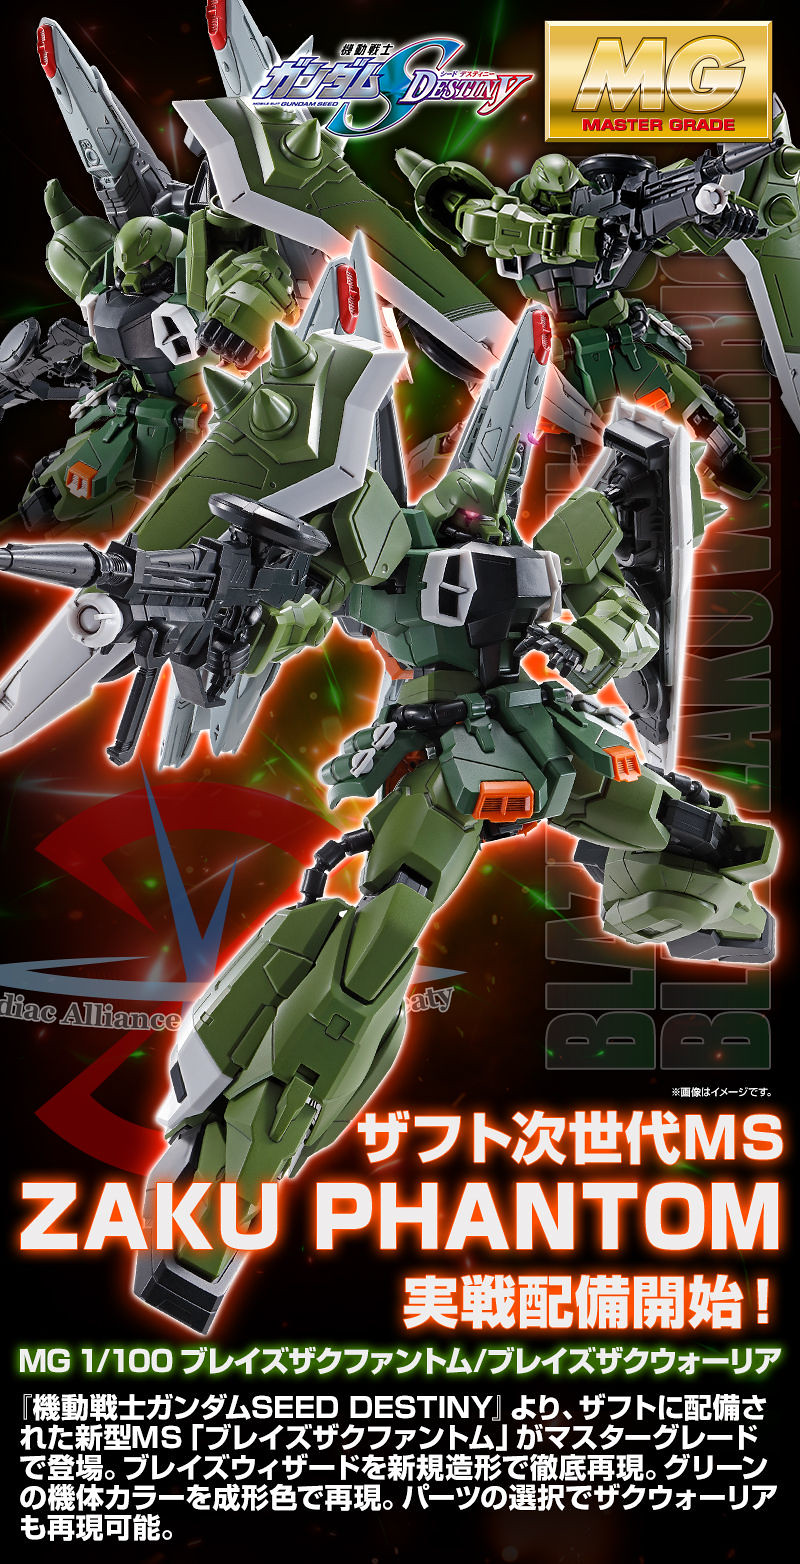 MG 1/100 瞬發型薩克幽靈/薩克戰士 新規造型再現瞬發型背包!【PB限定】